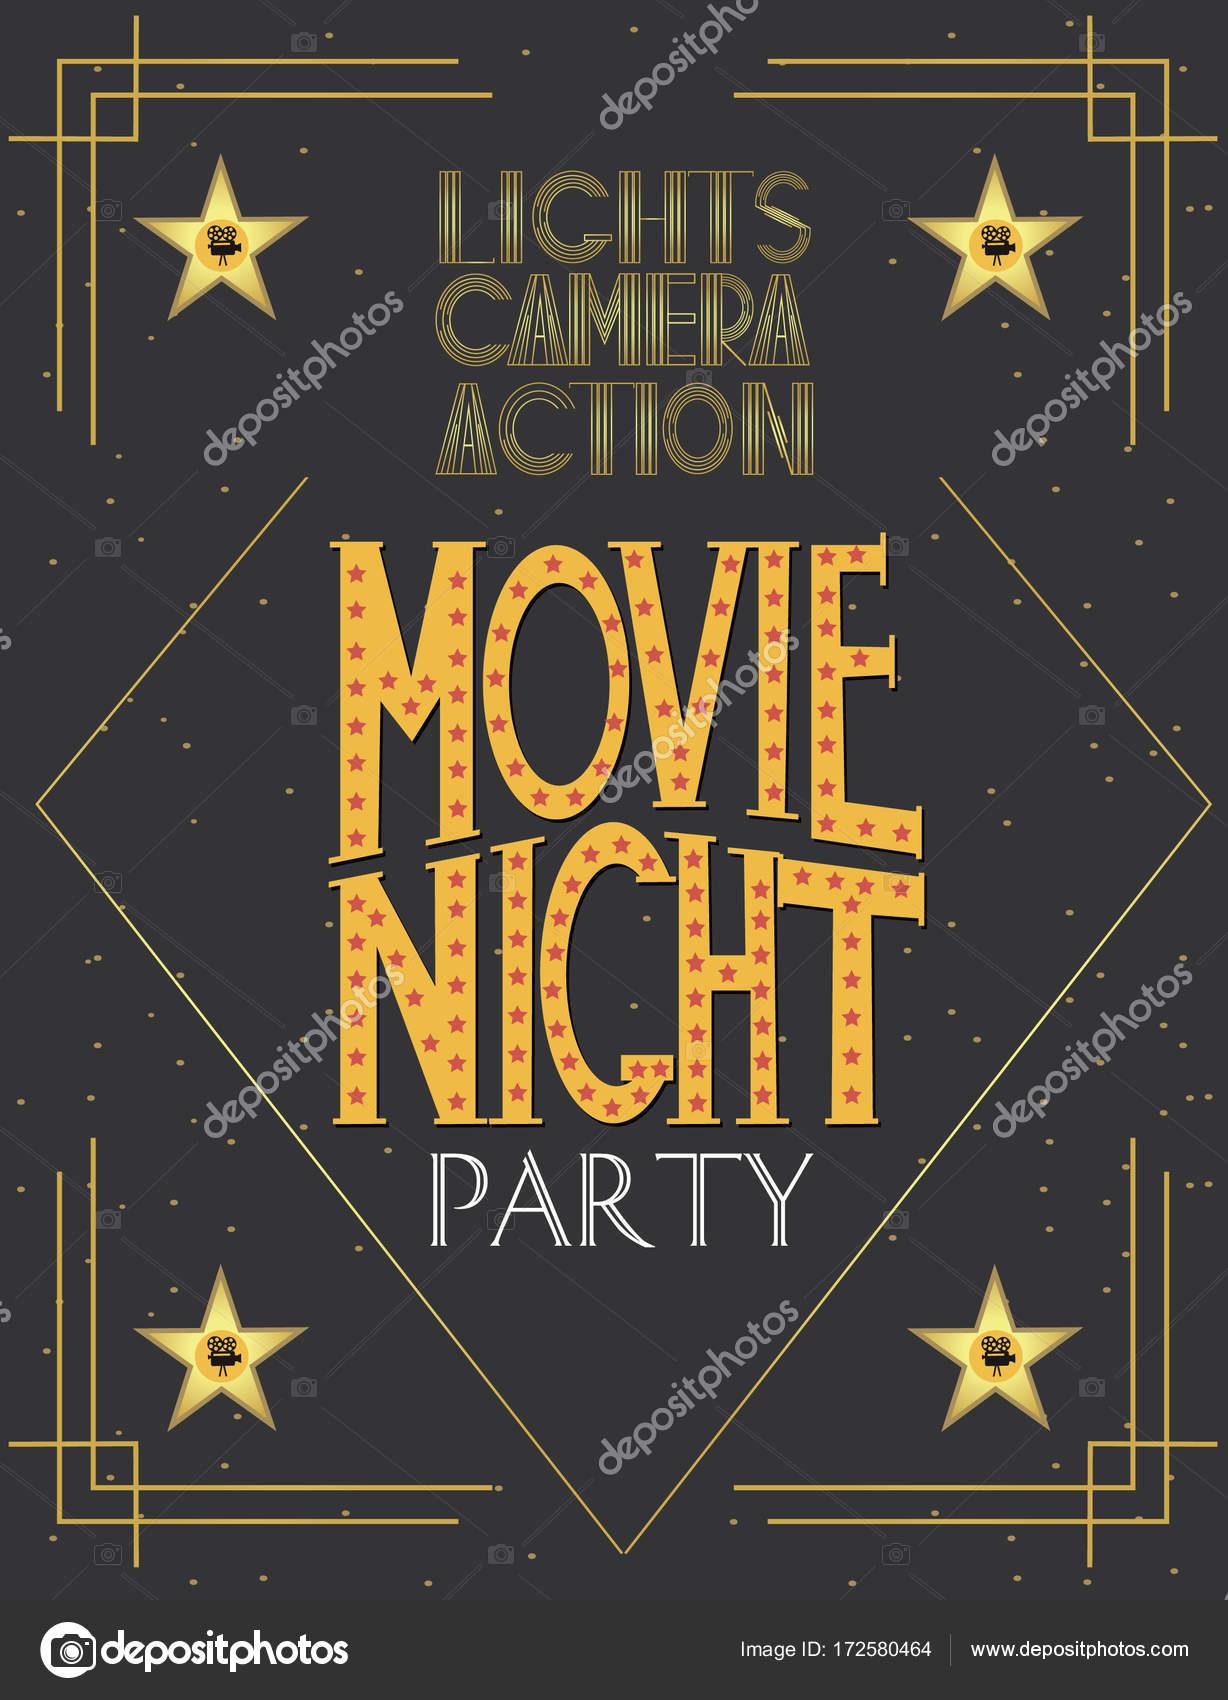 Nacht-Film-Party-Einladung-Karte — Stockvektor © MioBuono12 #172580464